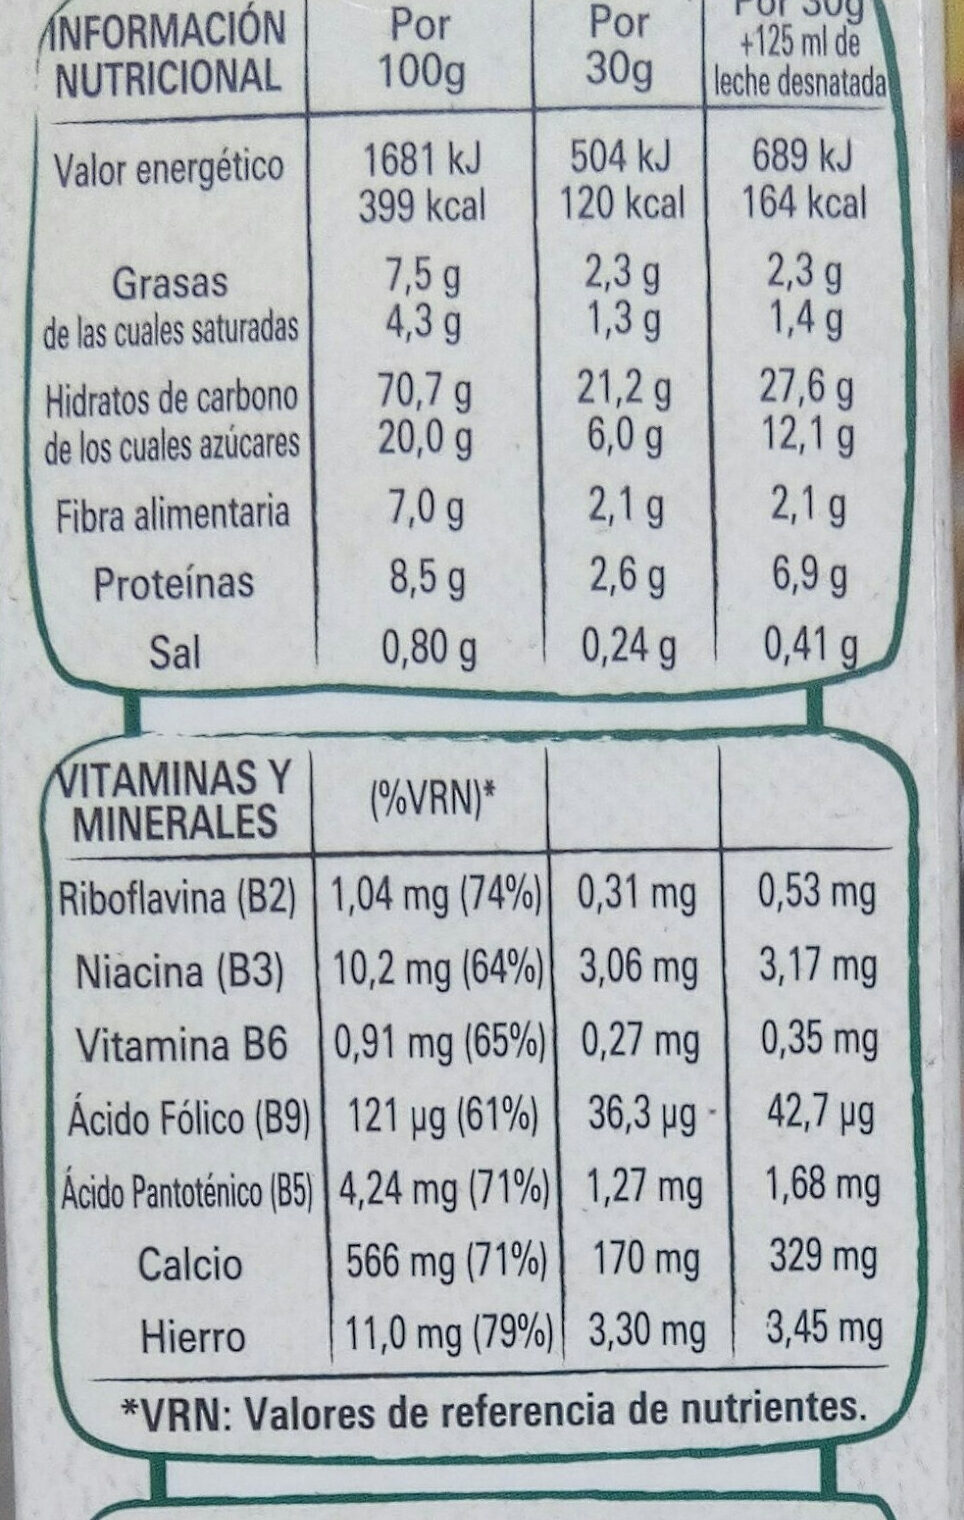 Fitness chocolate con leche - Informació nutricional - es